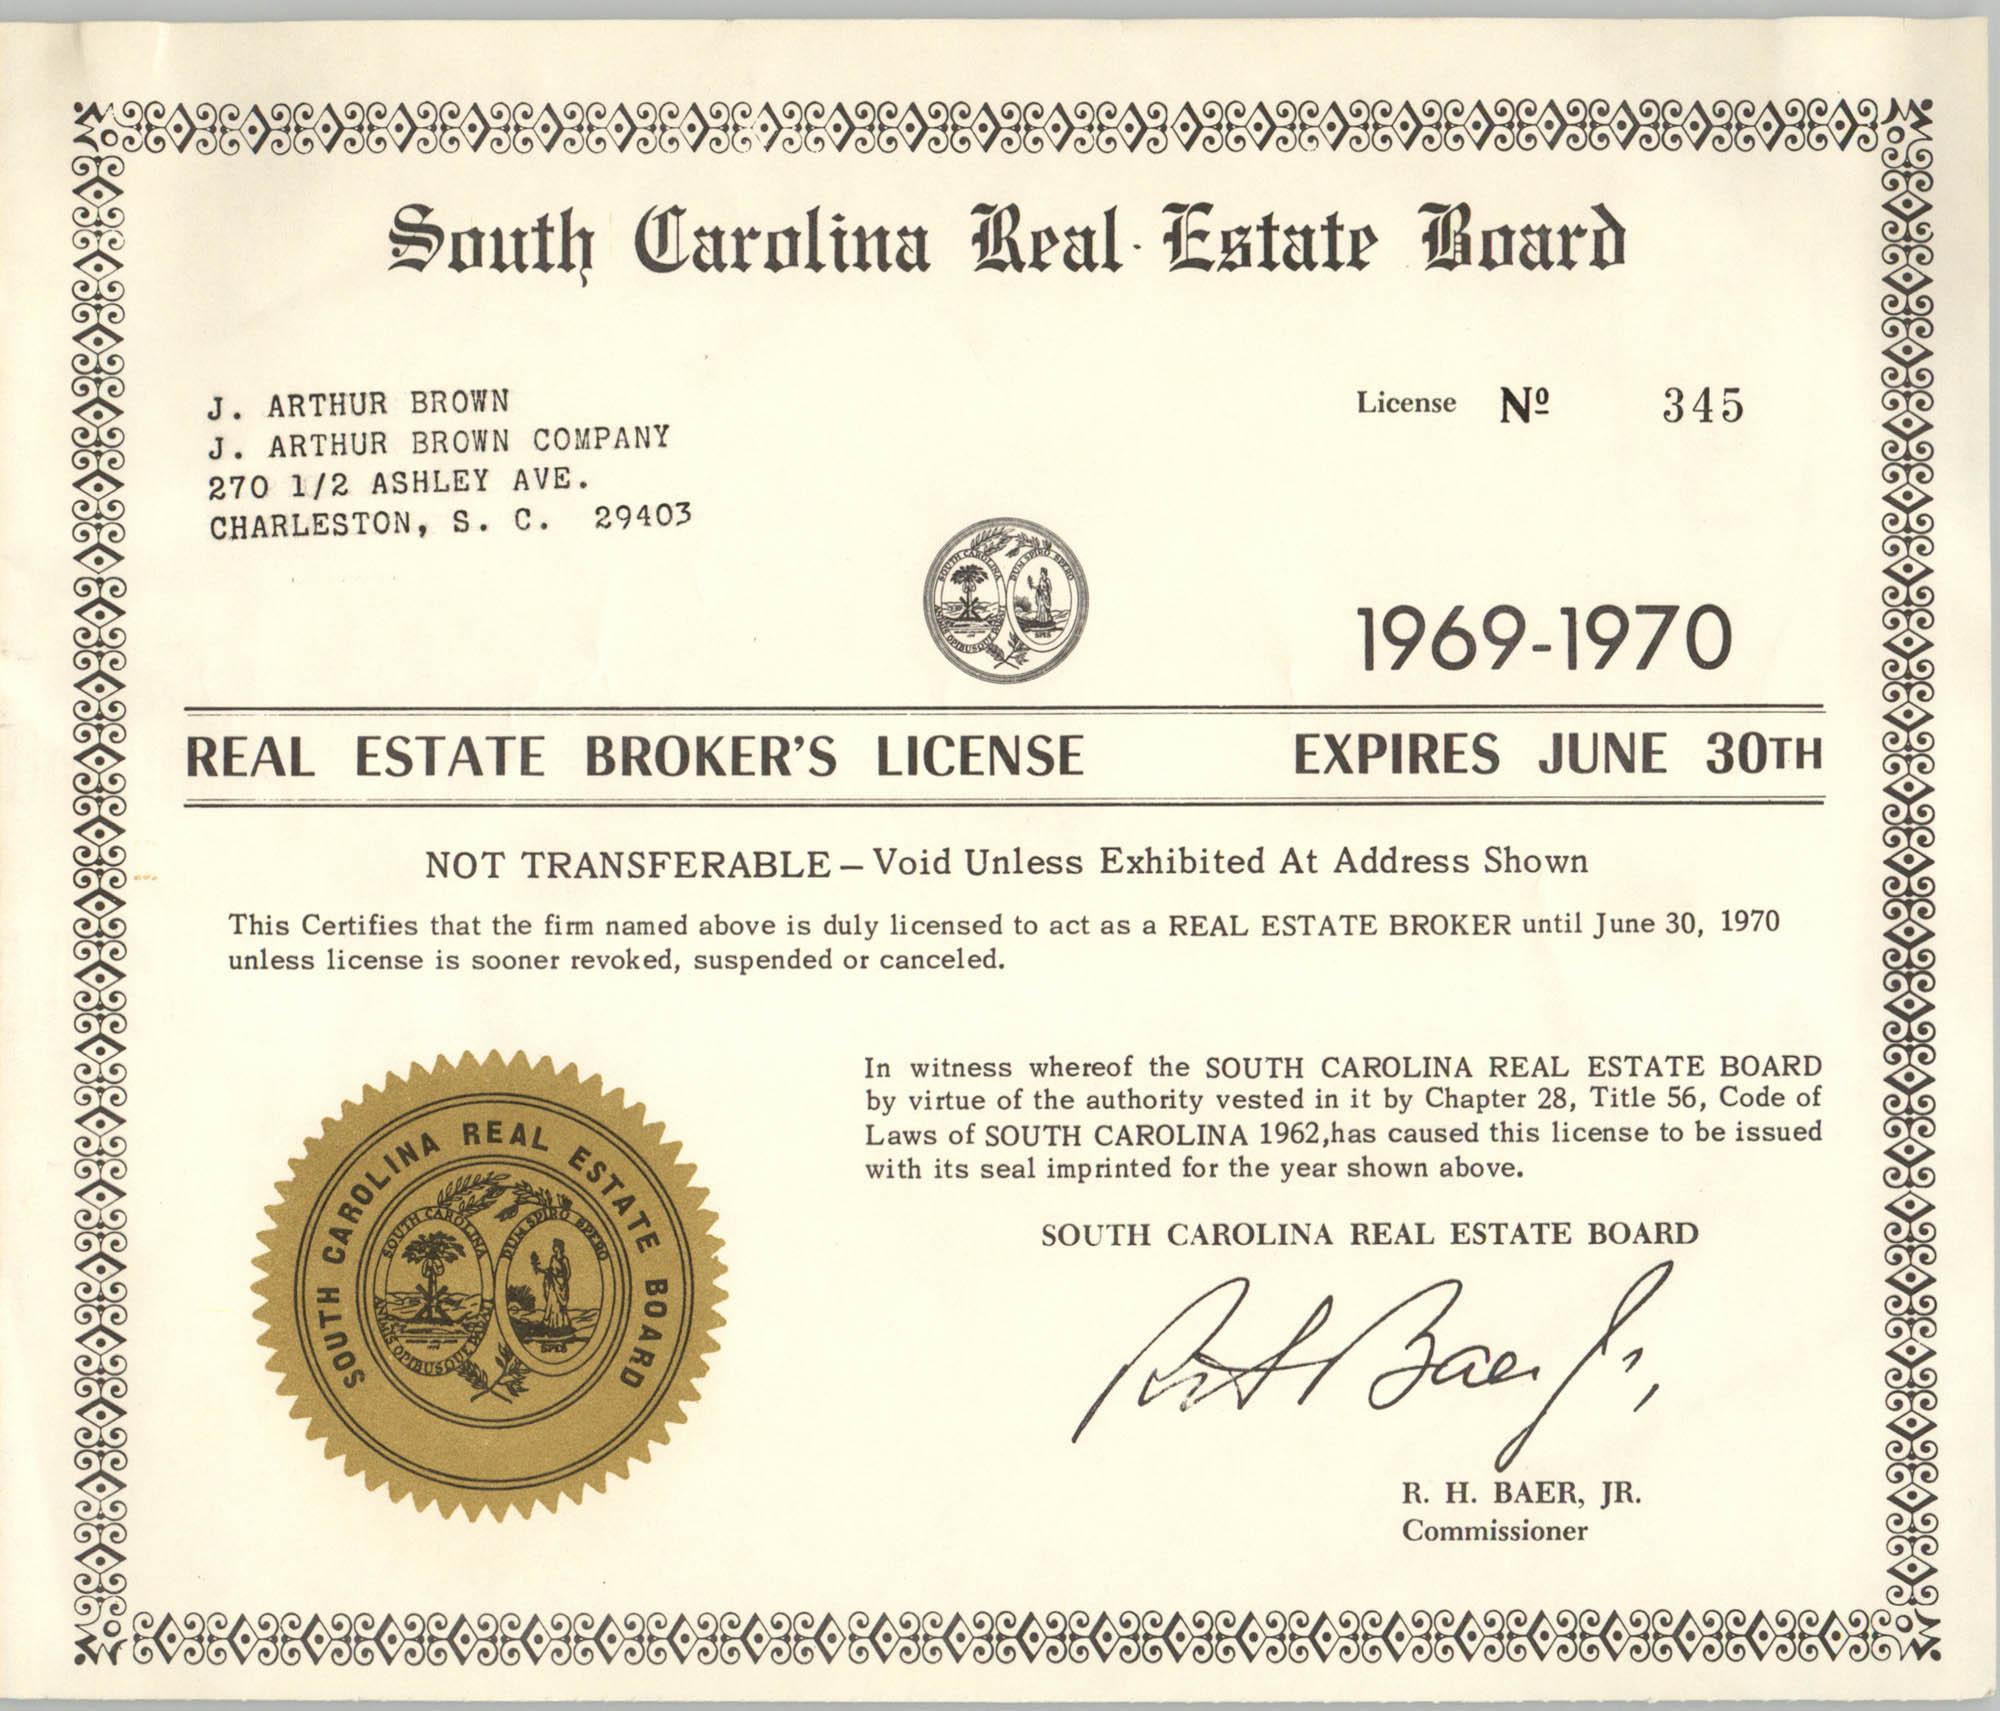 South Carolina Real Estate Board Real Estate Broker's License for J. Arthur Brown